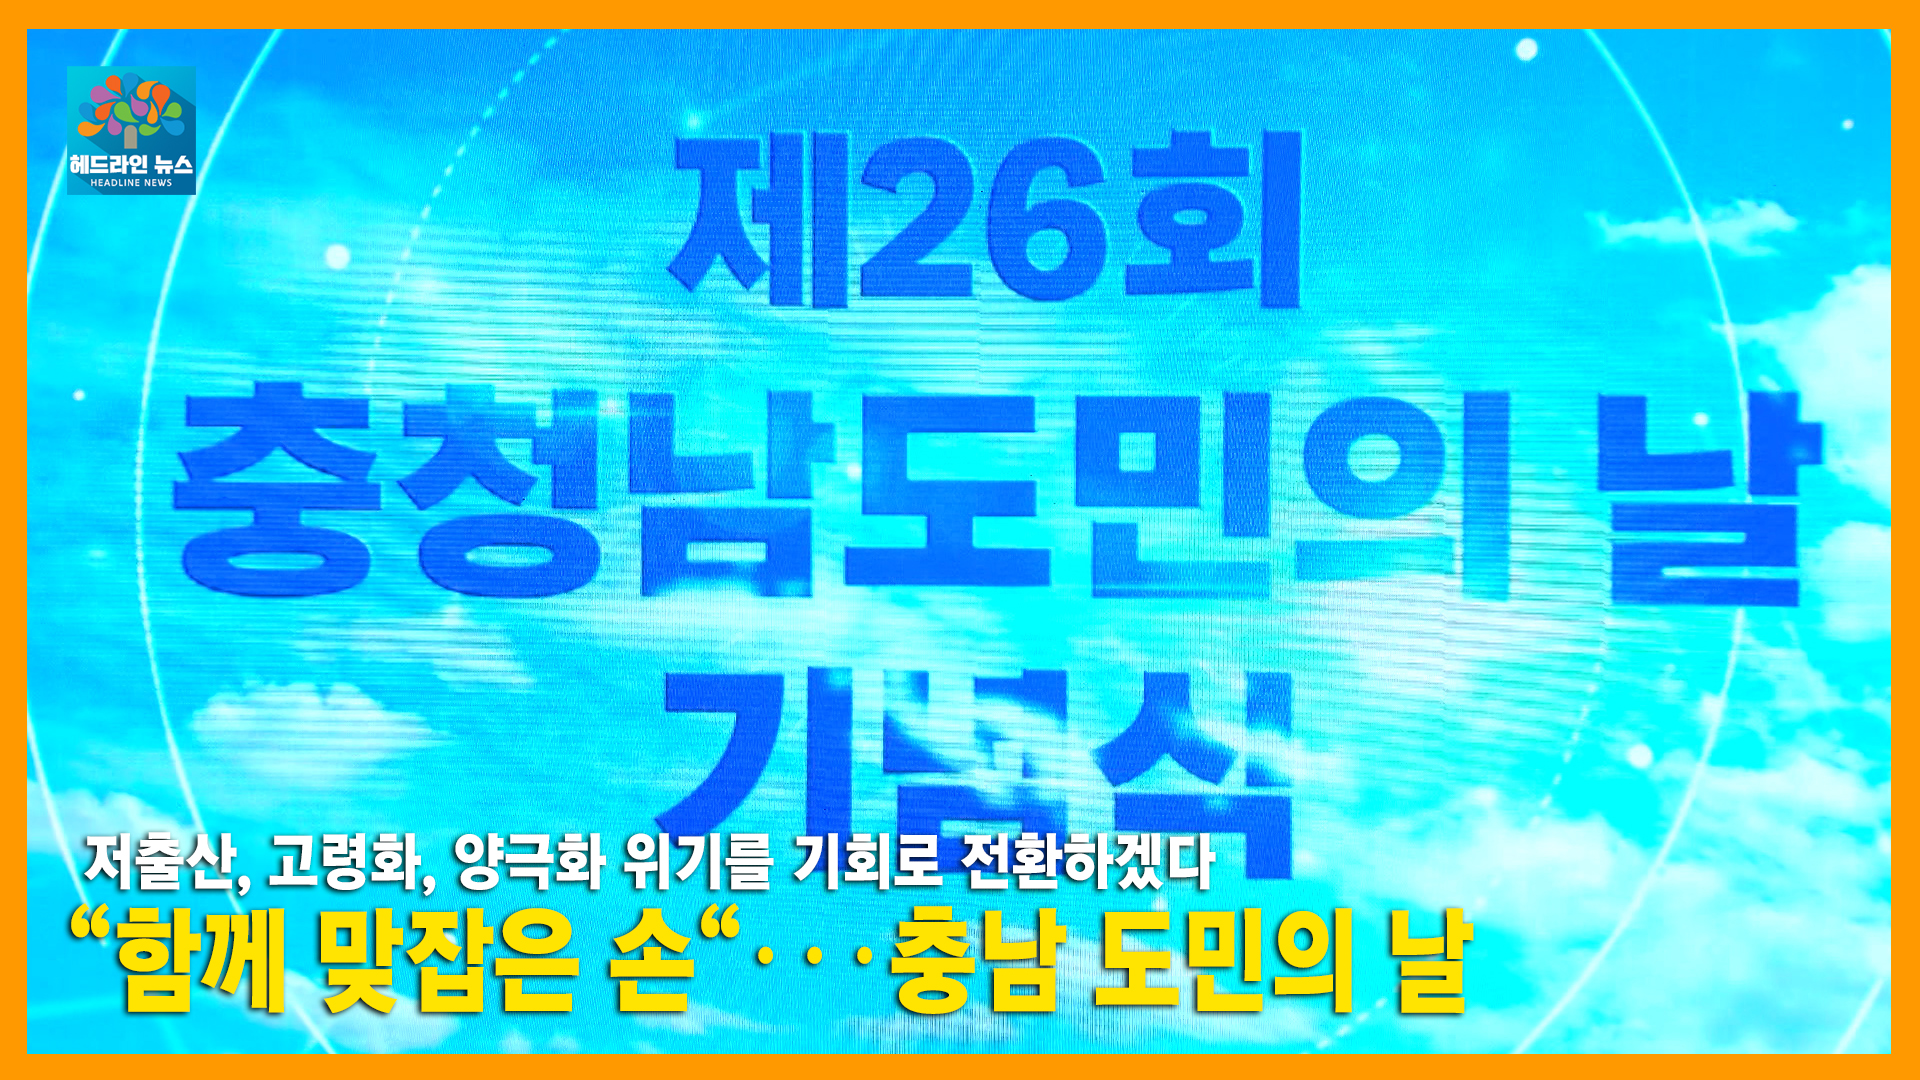 [NEWS]2021년 40회차 헤드라인뉴스